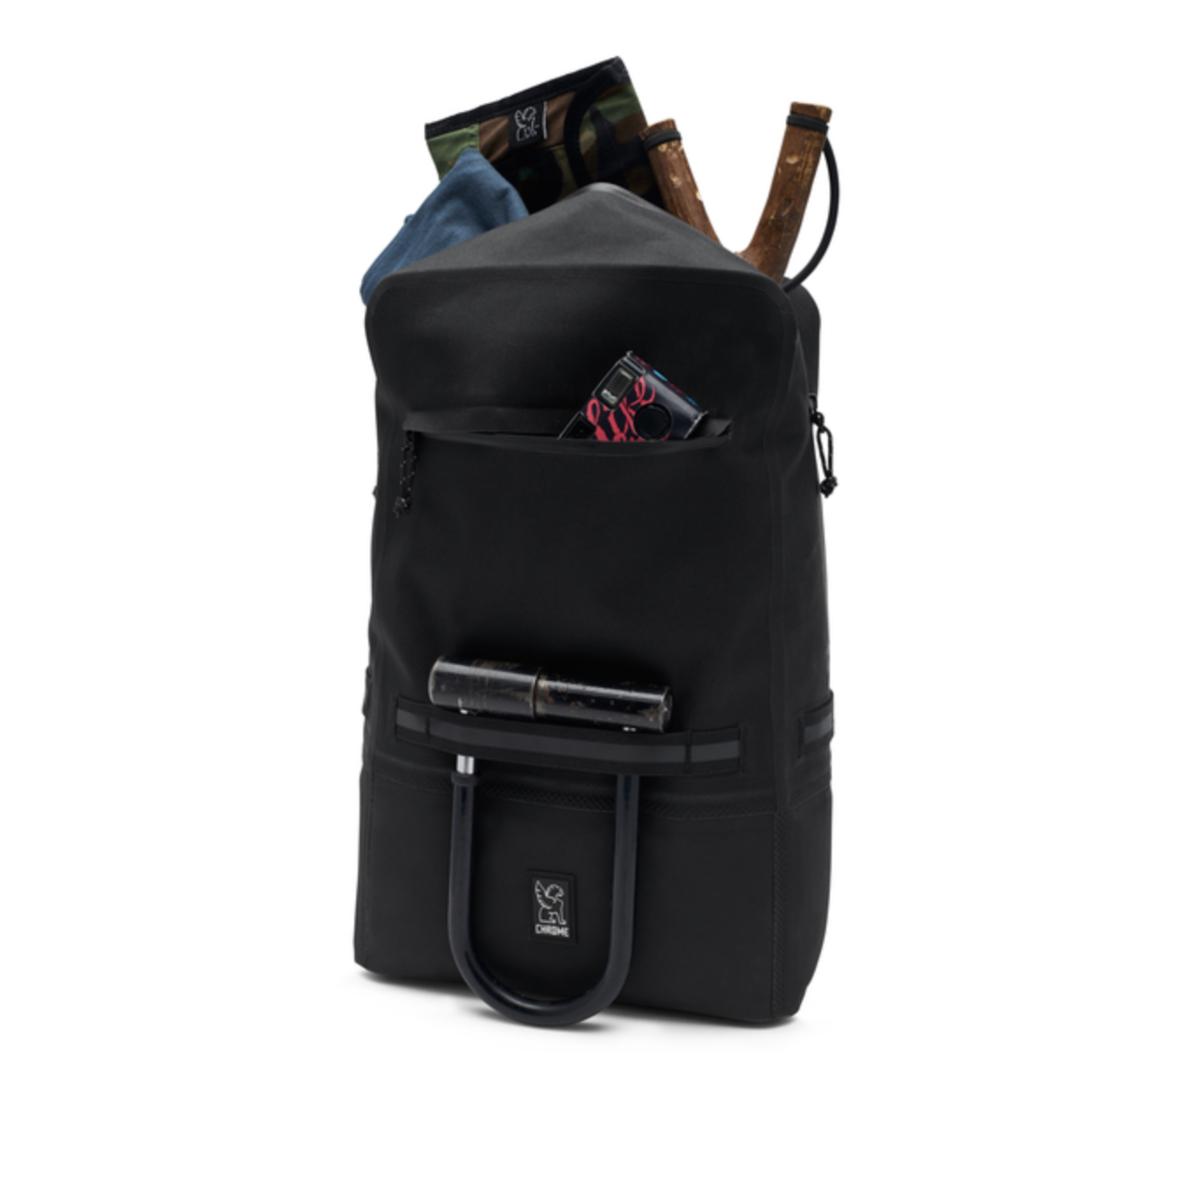 f:id:thebackpack:20190520184358p:plain